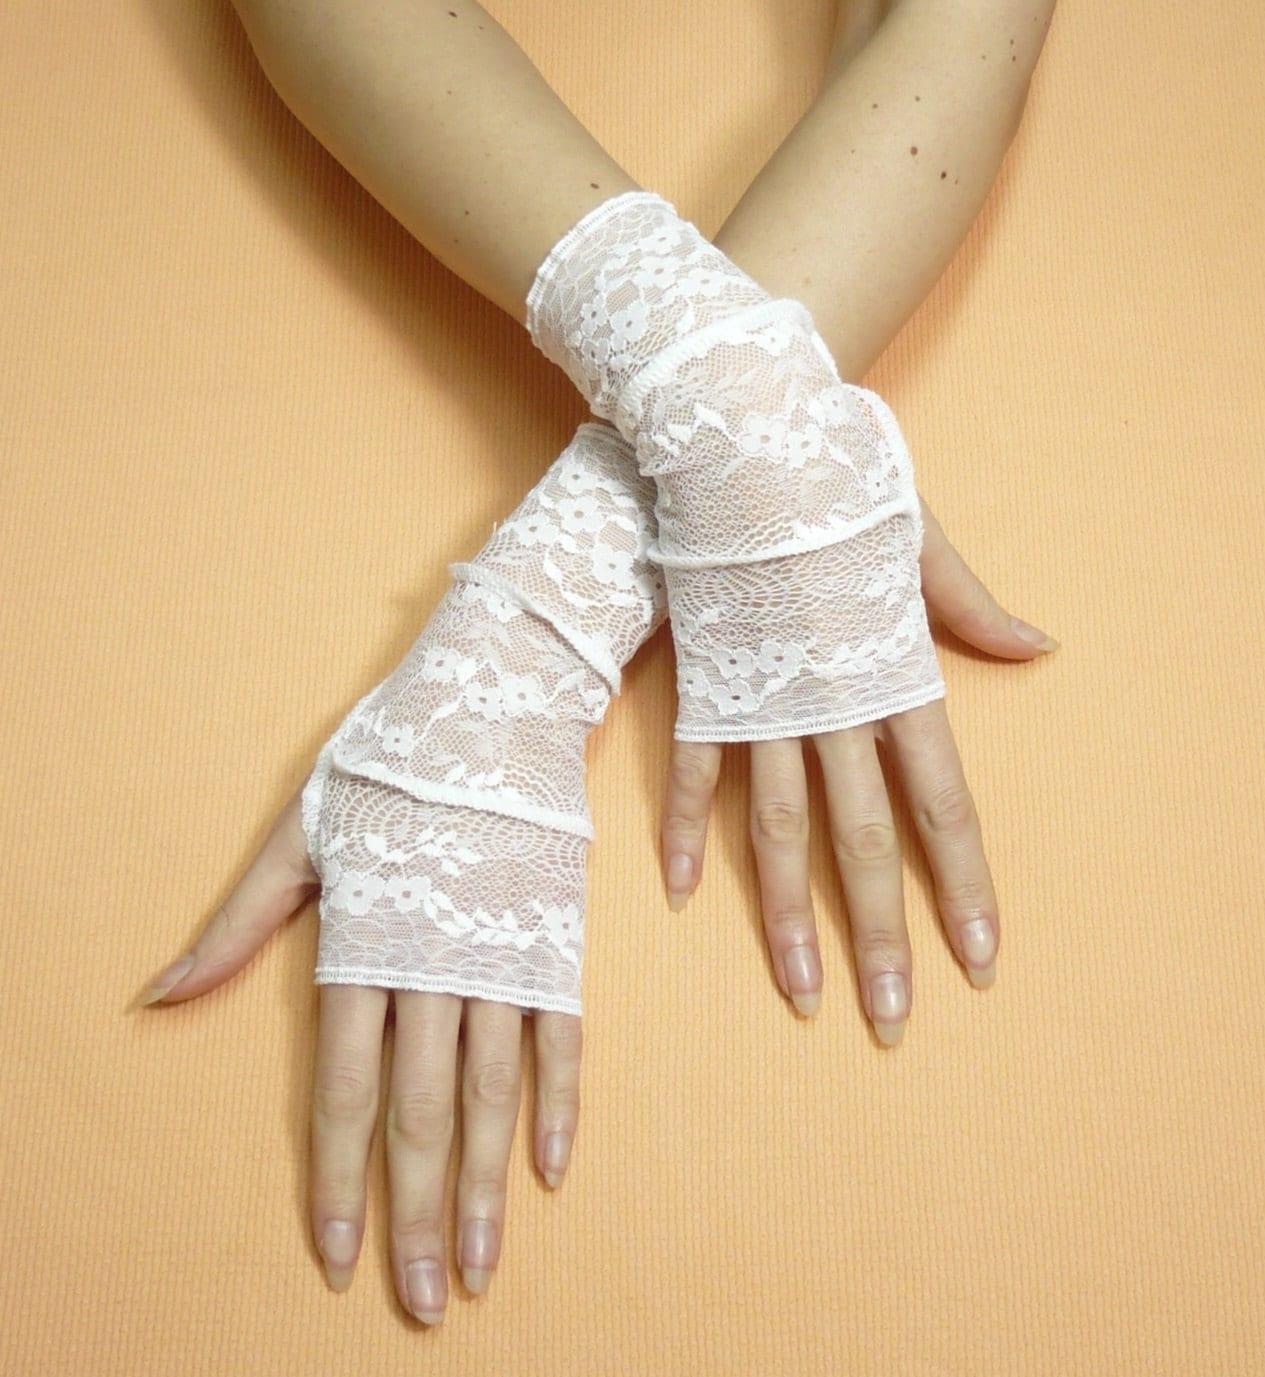 white lace fingerless gloves trashy armwarmers bohemian